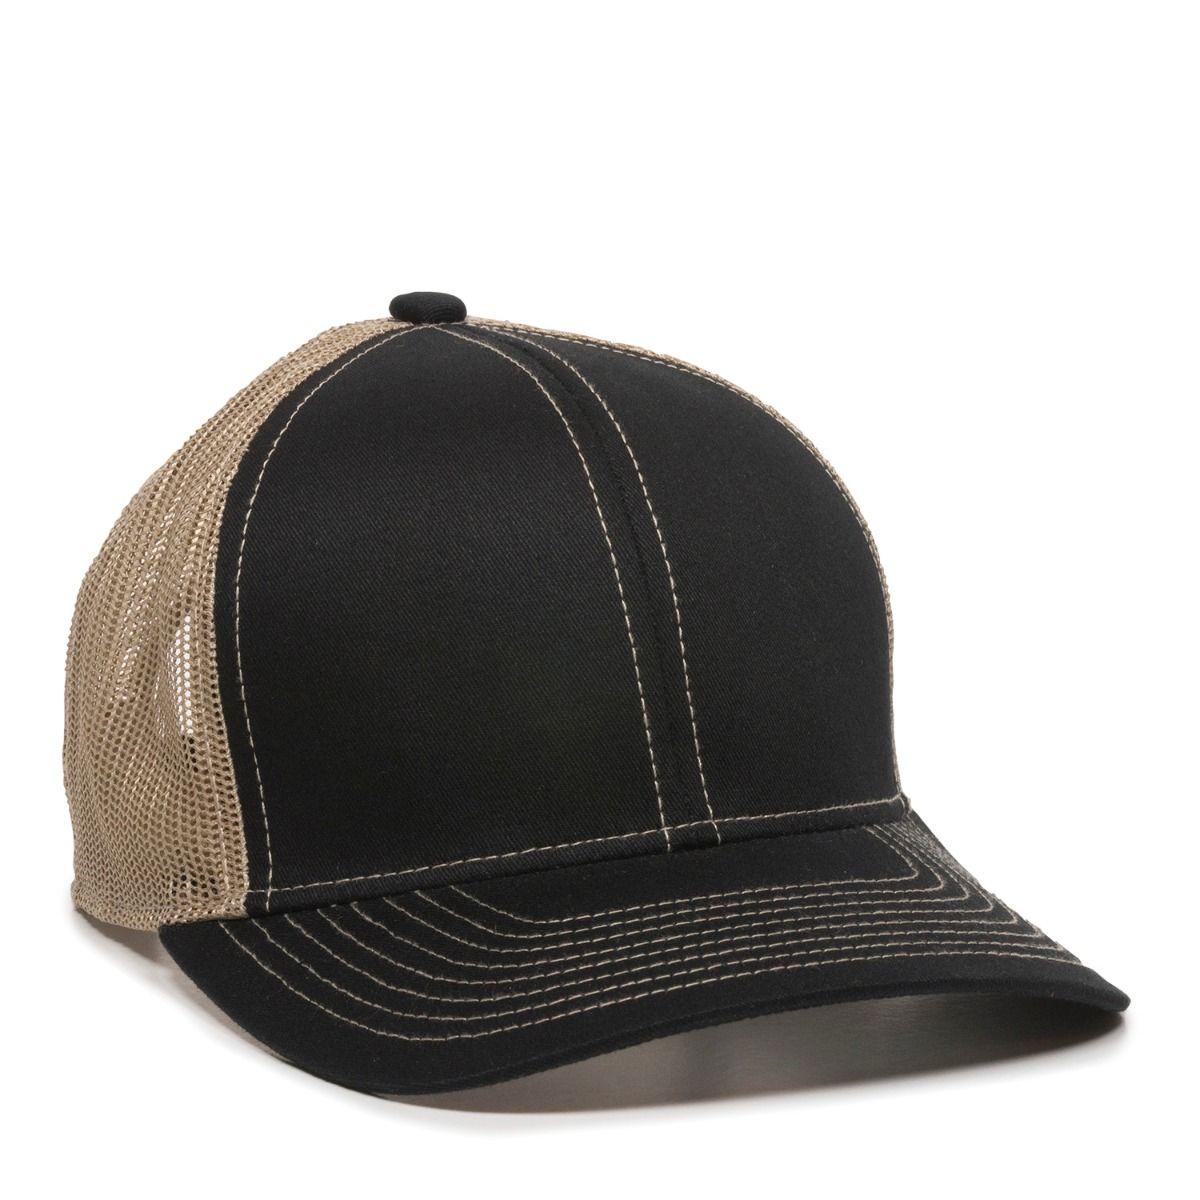 45c6e9c99 MBW-800 | Outdoor Cap - Team Headwear